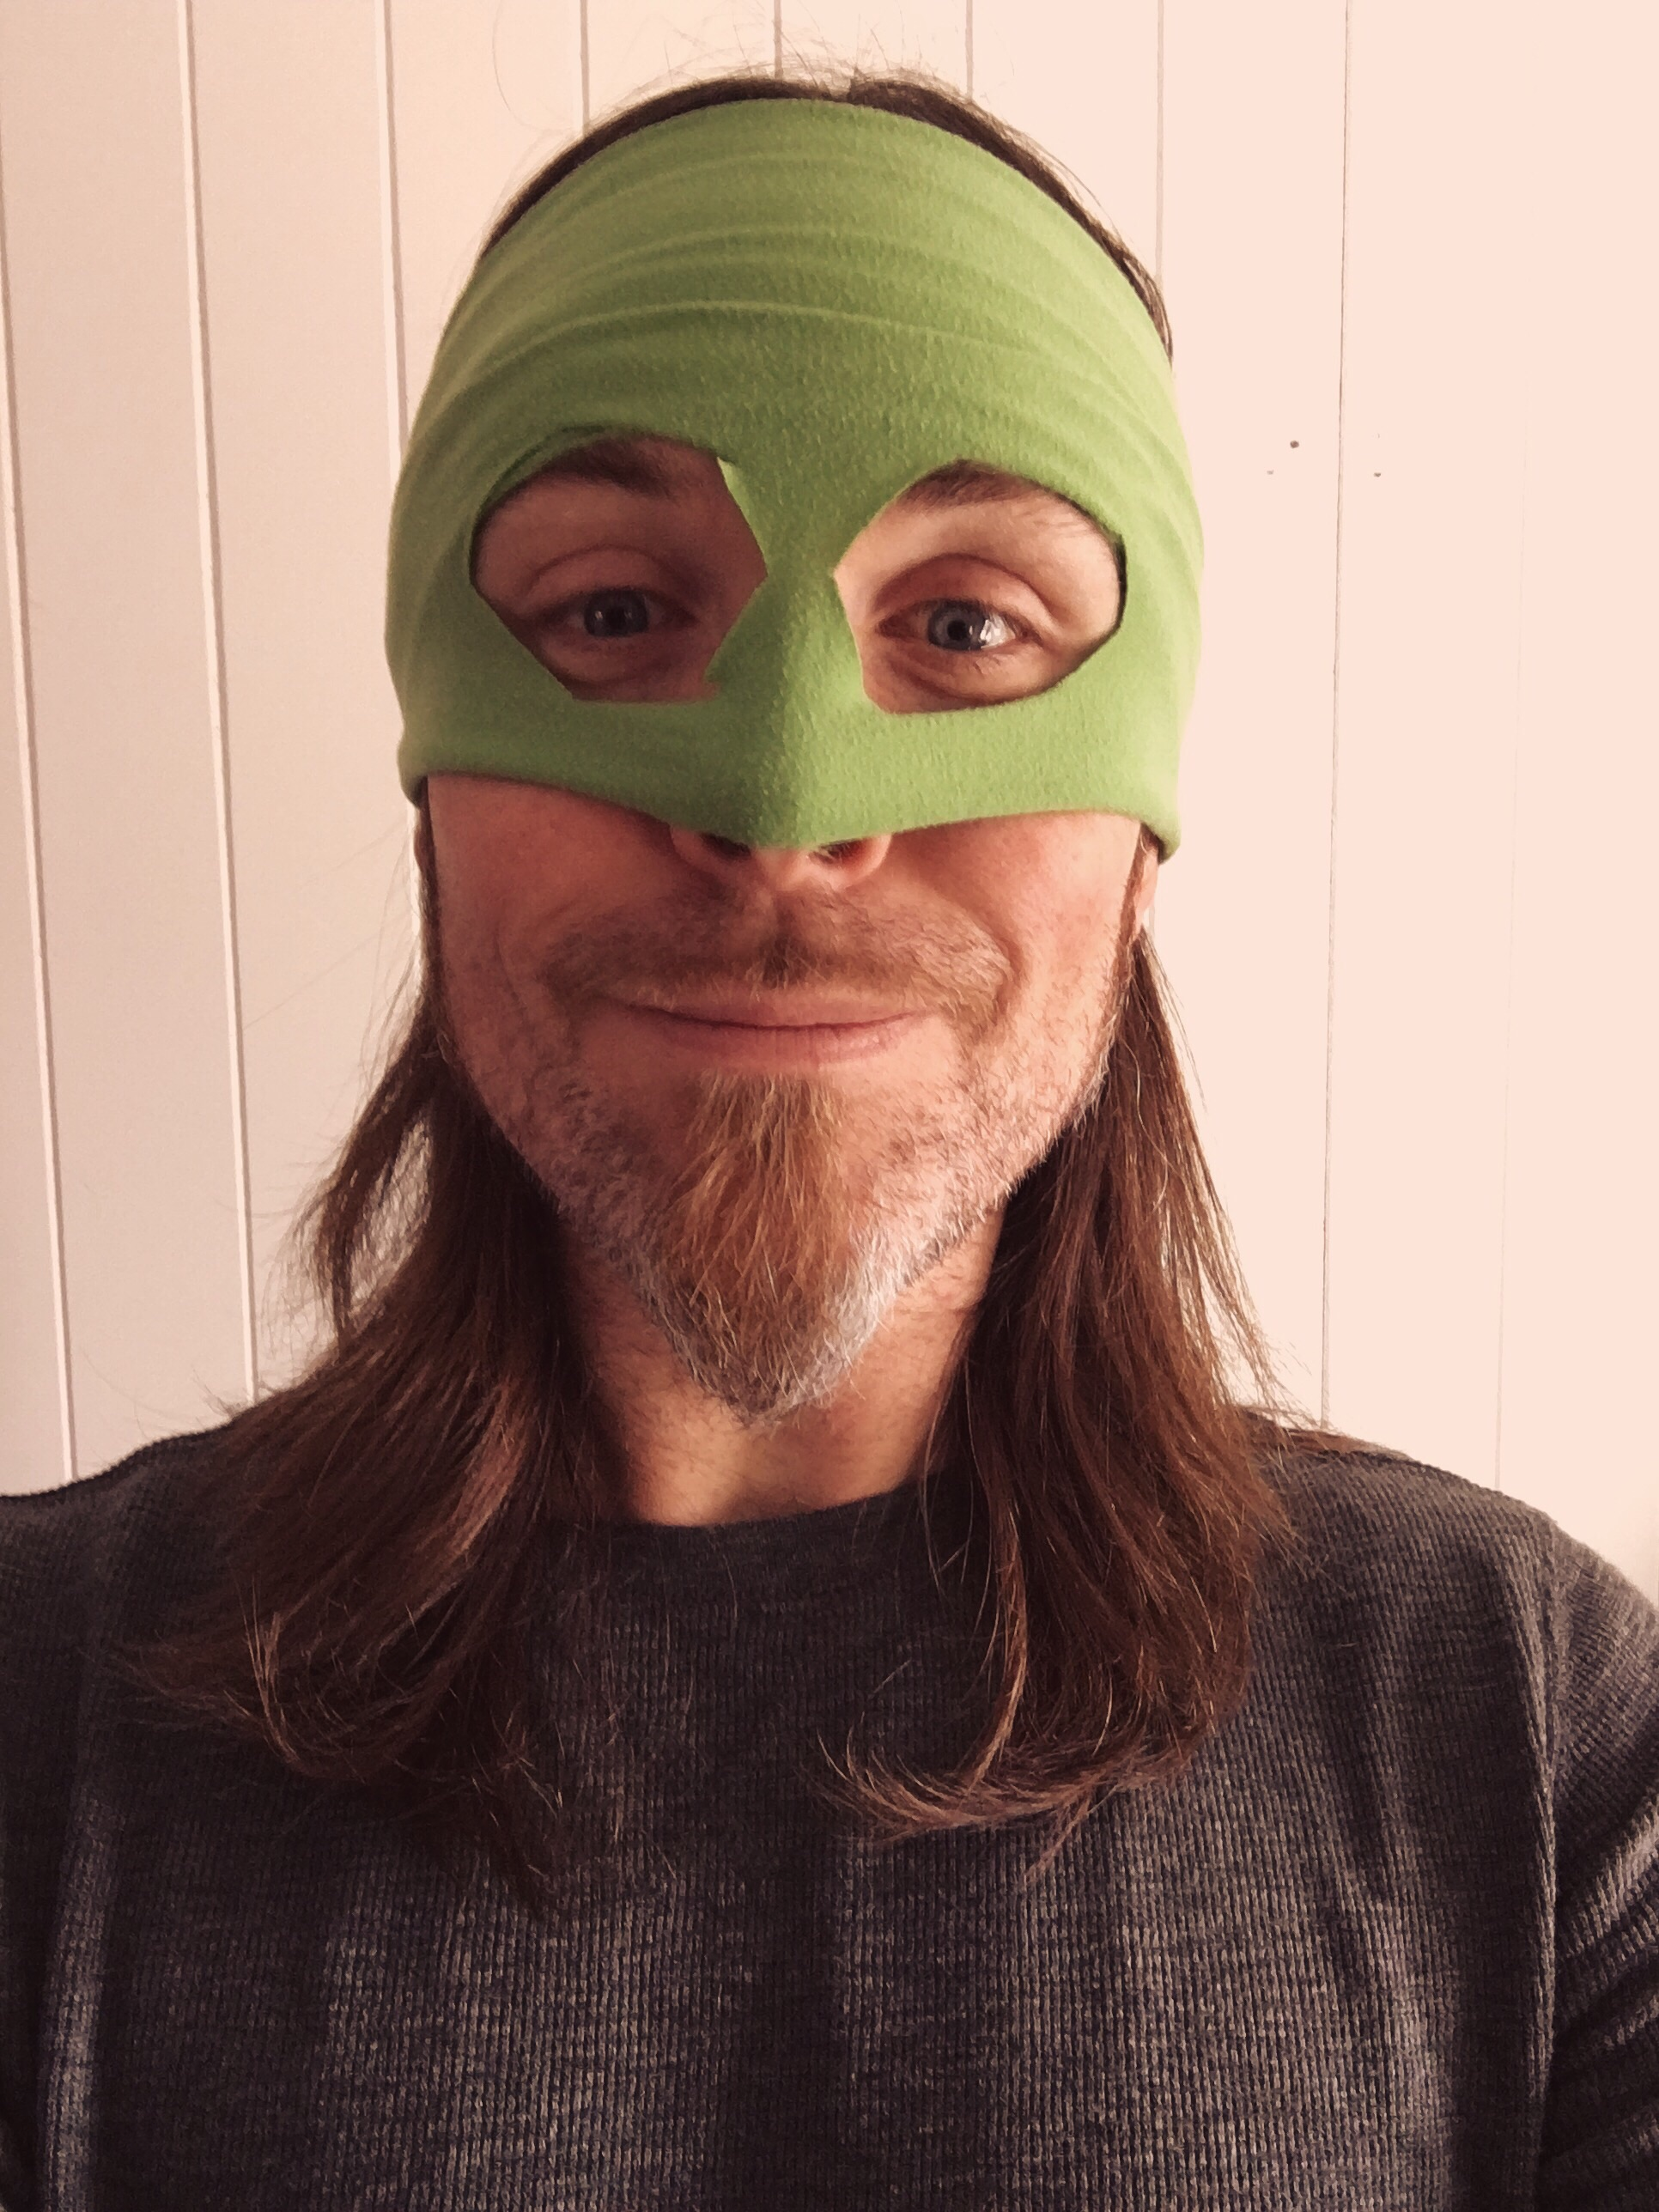 The Green Conquistador!